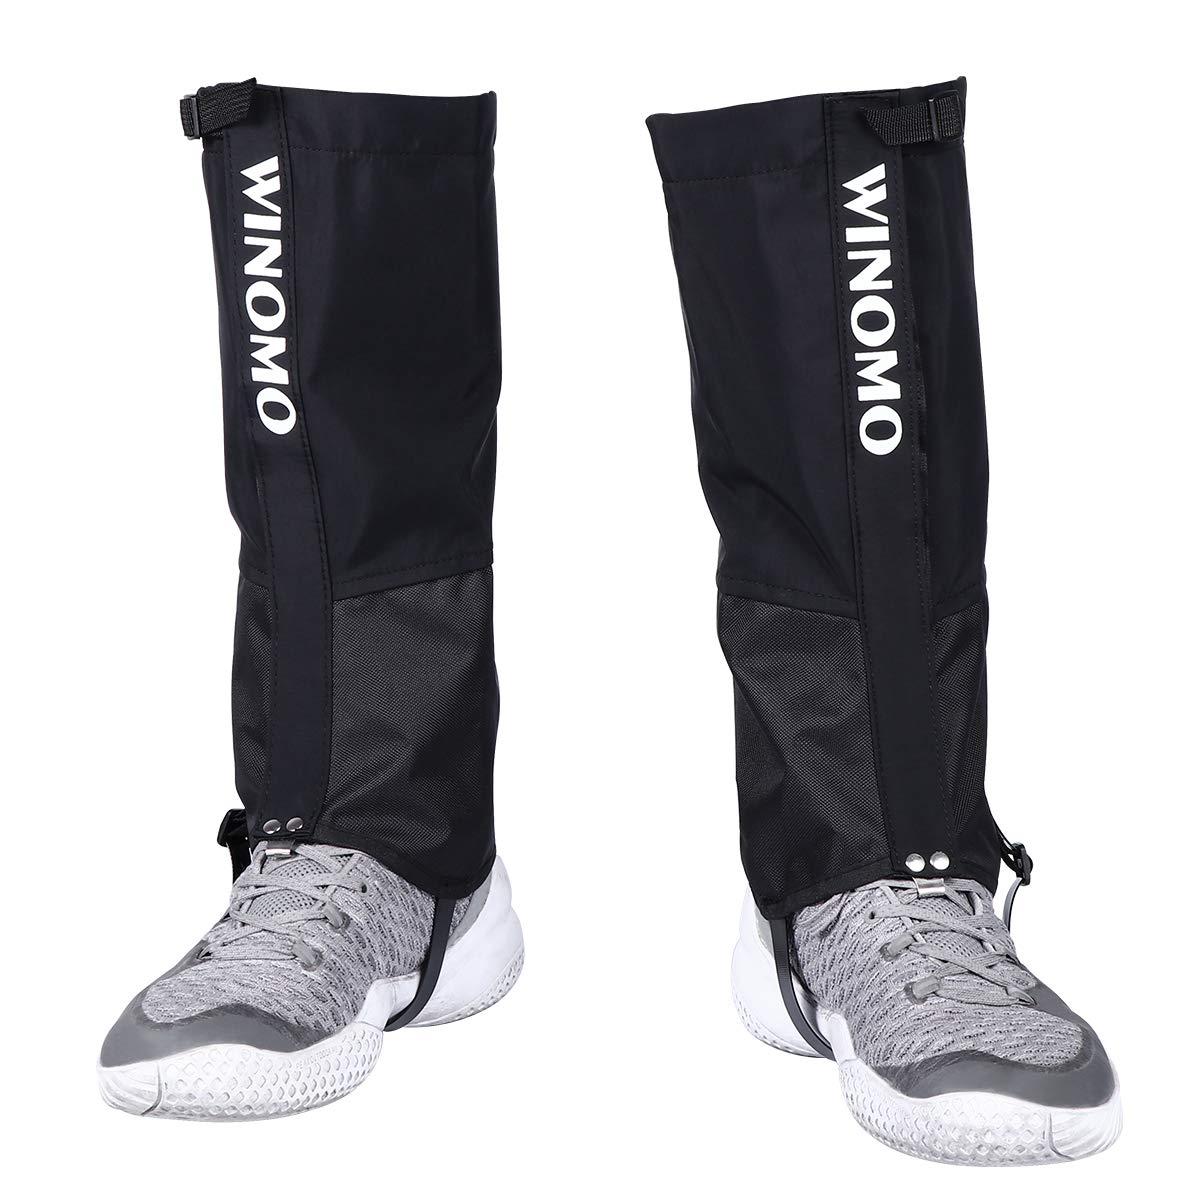 WINOMO Hiking Leg Gaiters Waterproof Anti-Tear Snow Boot Covers Gaiter for Women and Men